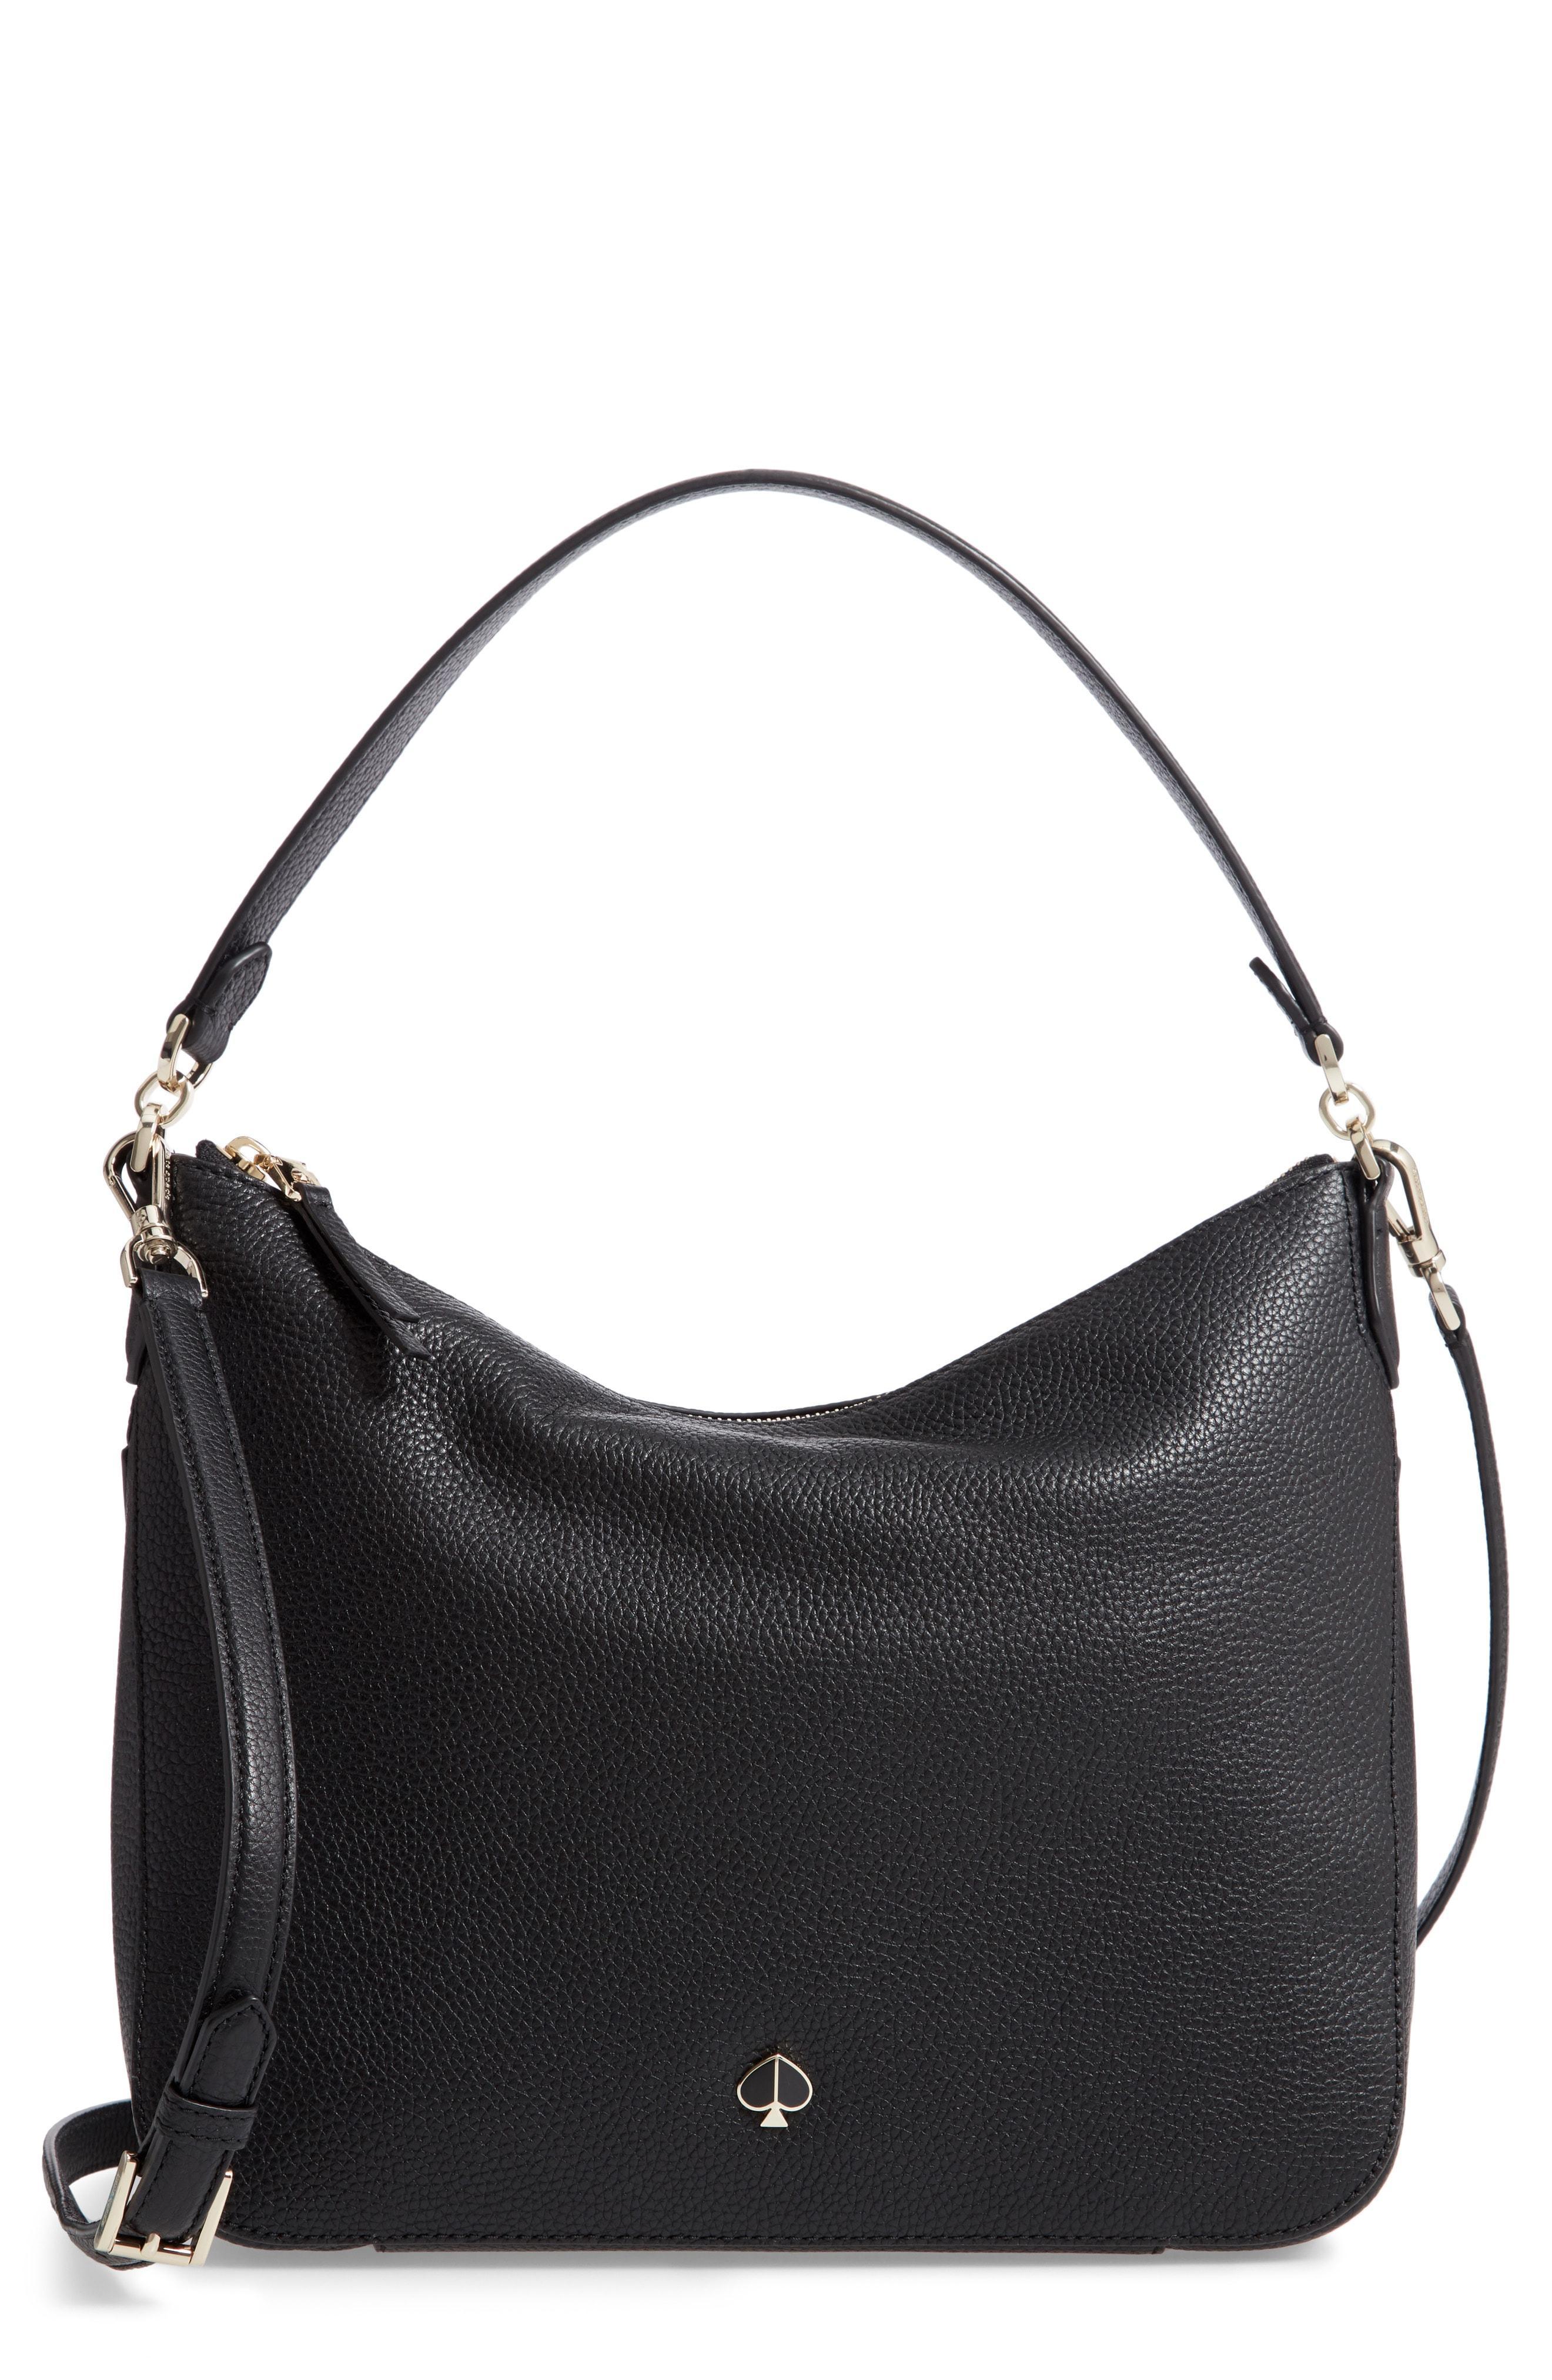 fefc8d64a0b9 Lyst - Kate Spade Medium Polly Leather Shoulder Bag in Black